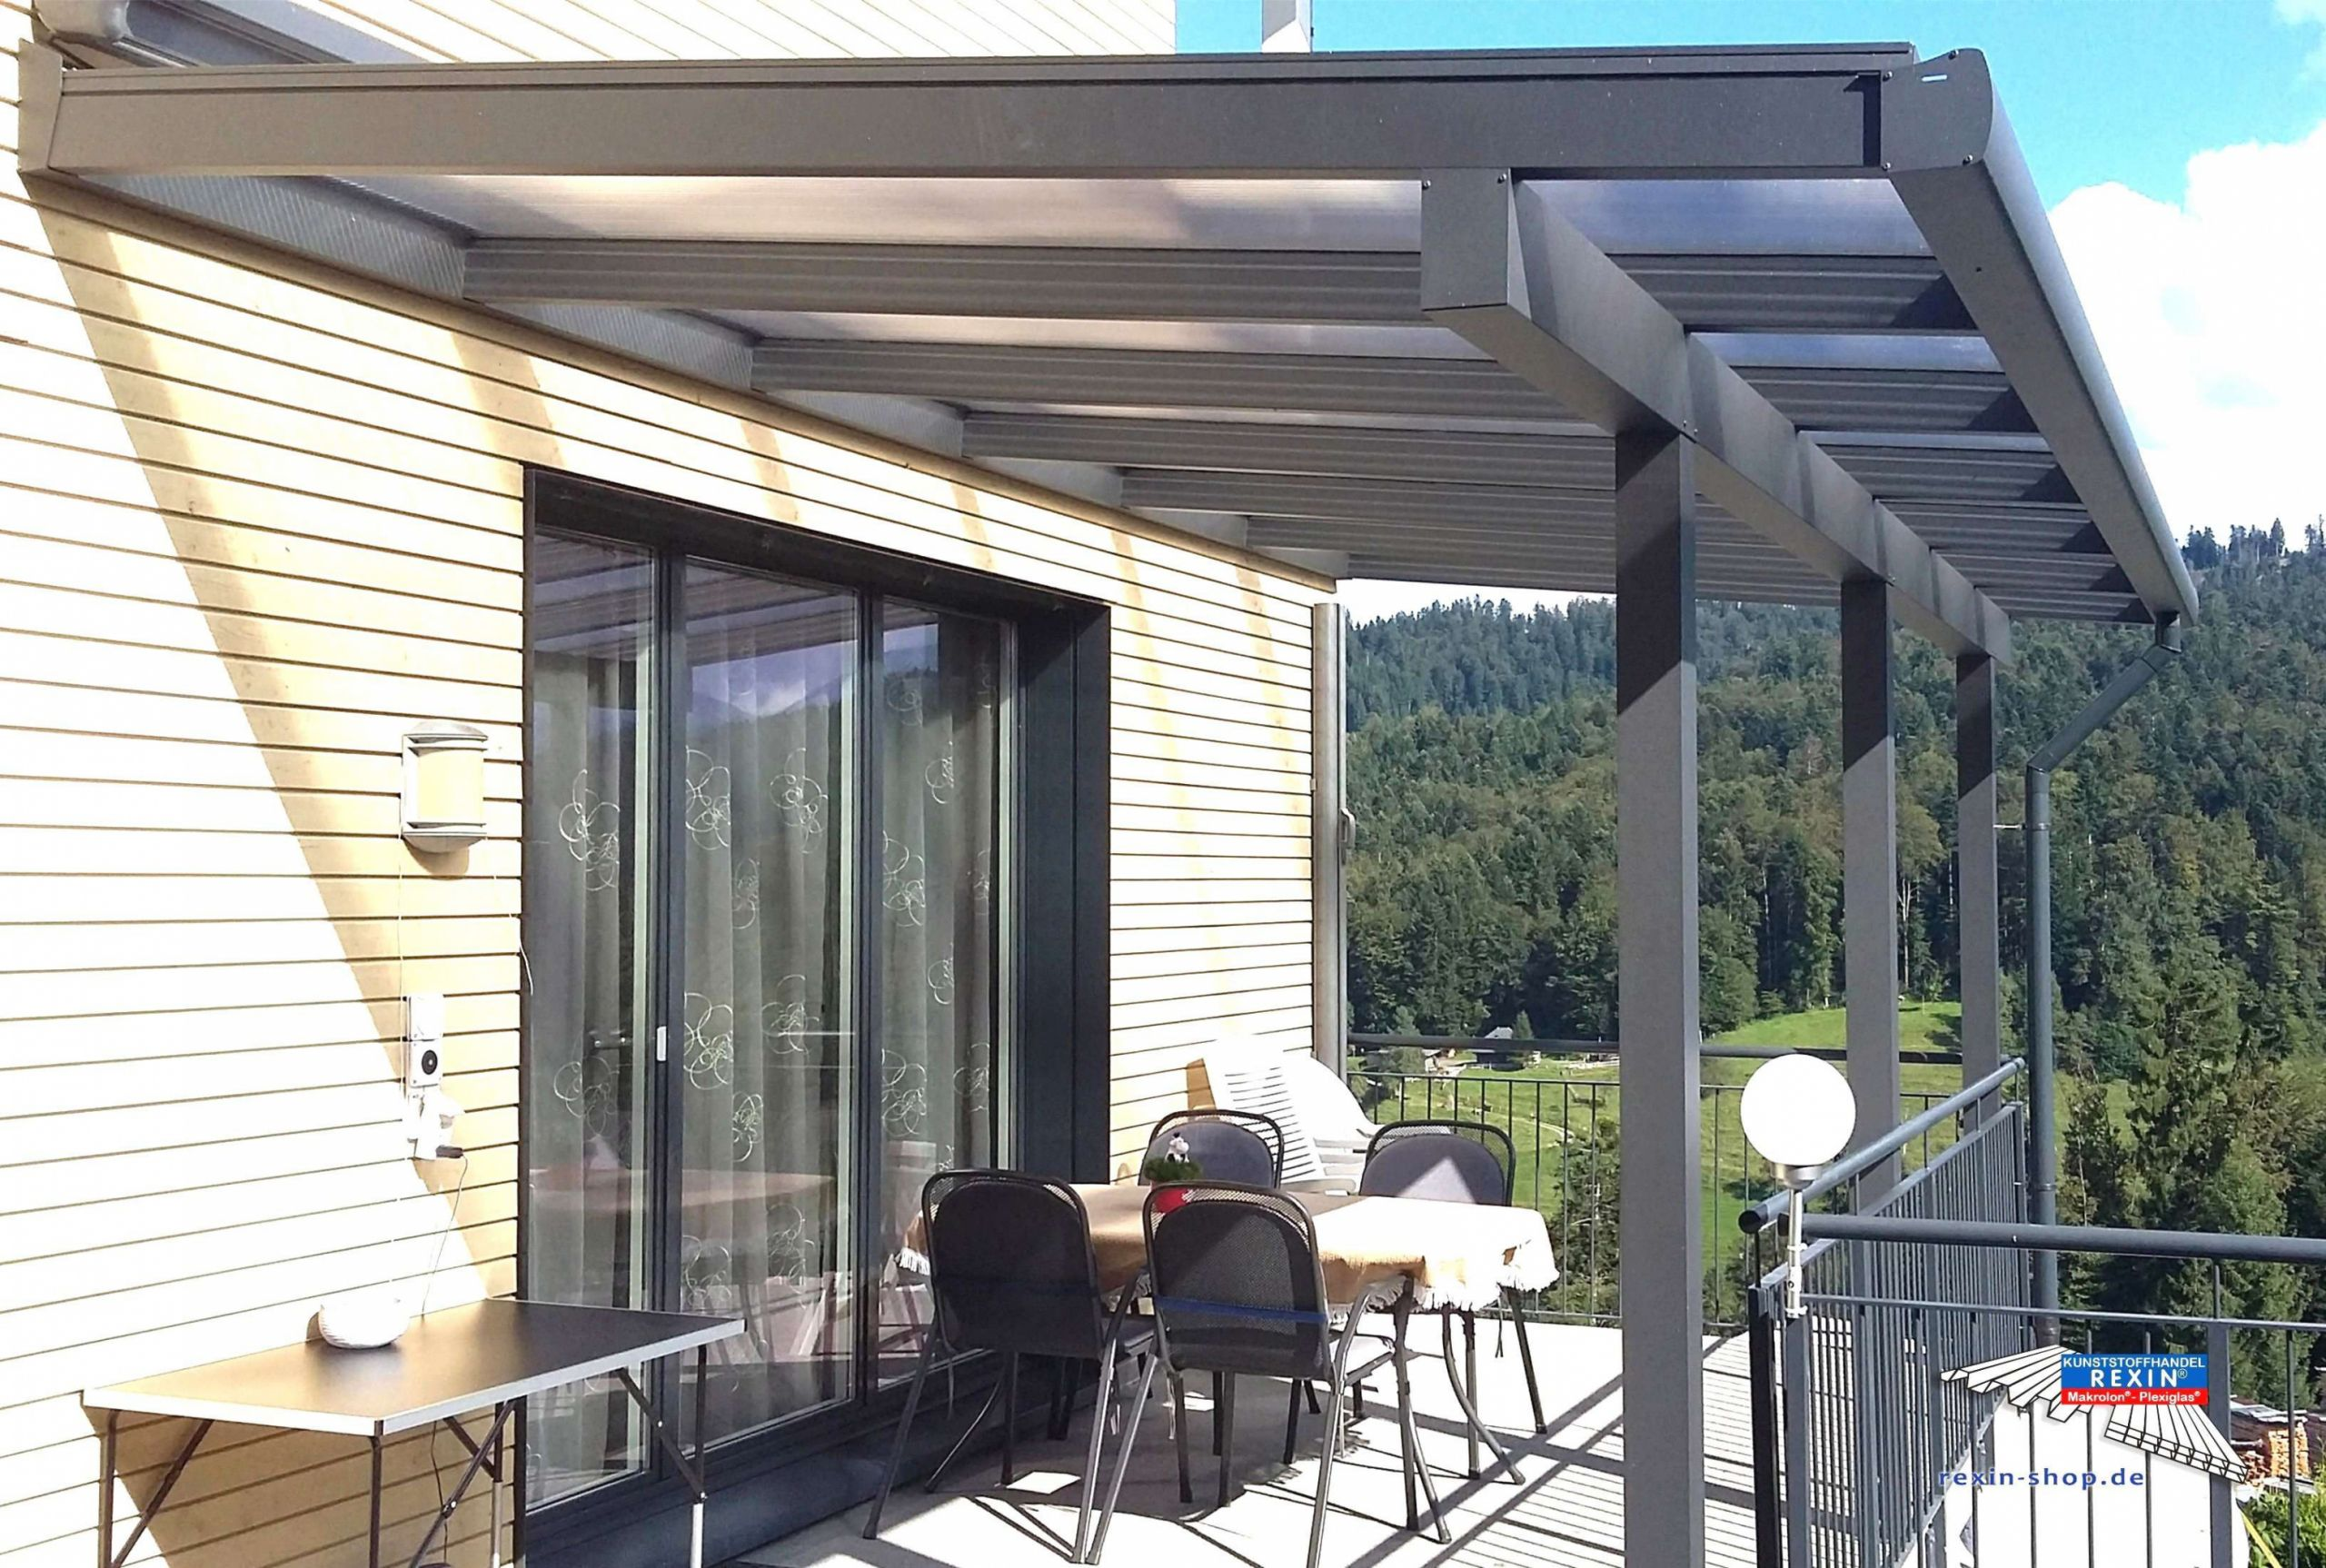 moderne terrasse idee sonnensegel elektrisch 0d archives terrasse moderne terrassen ideen moderne terrassen ideen